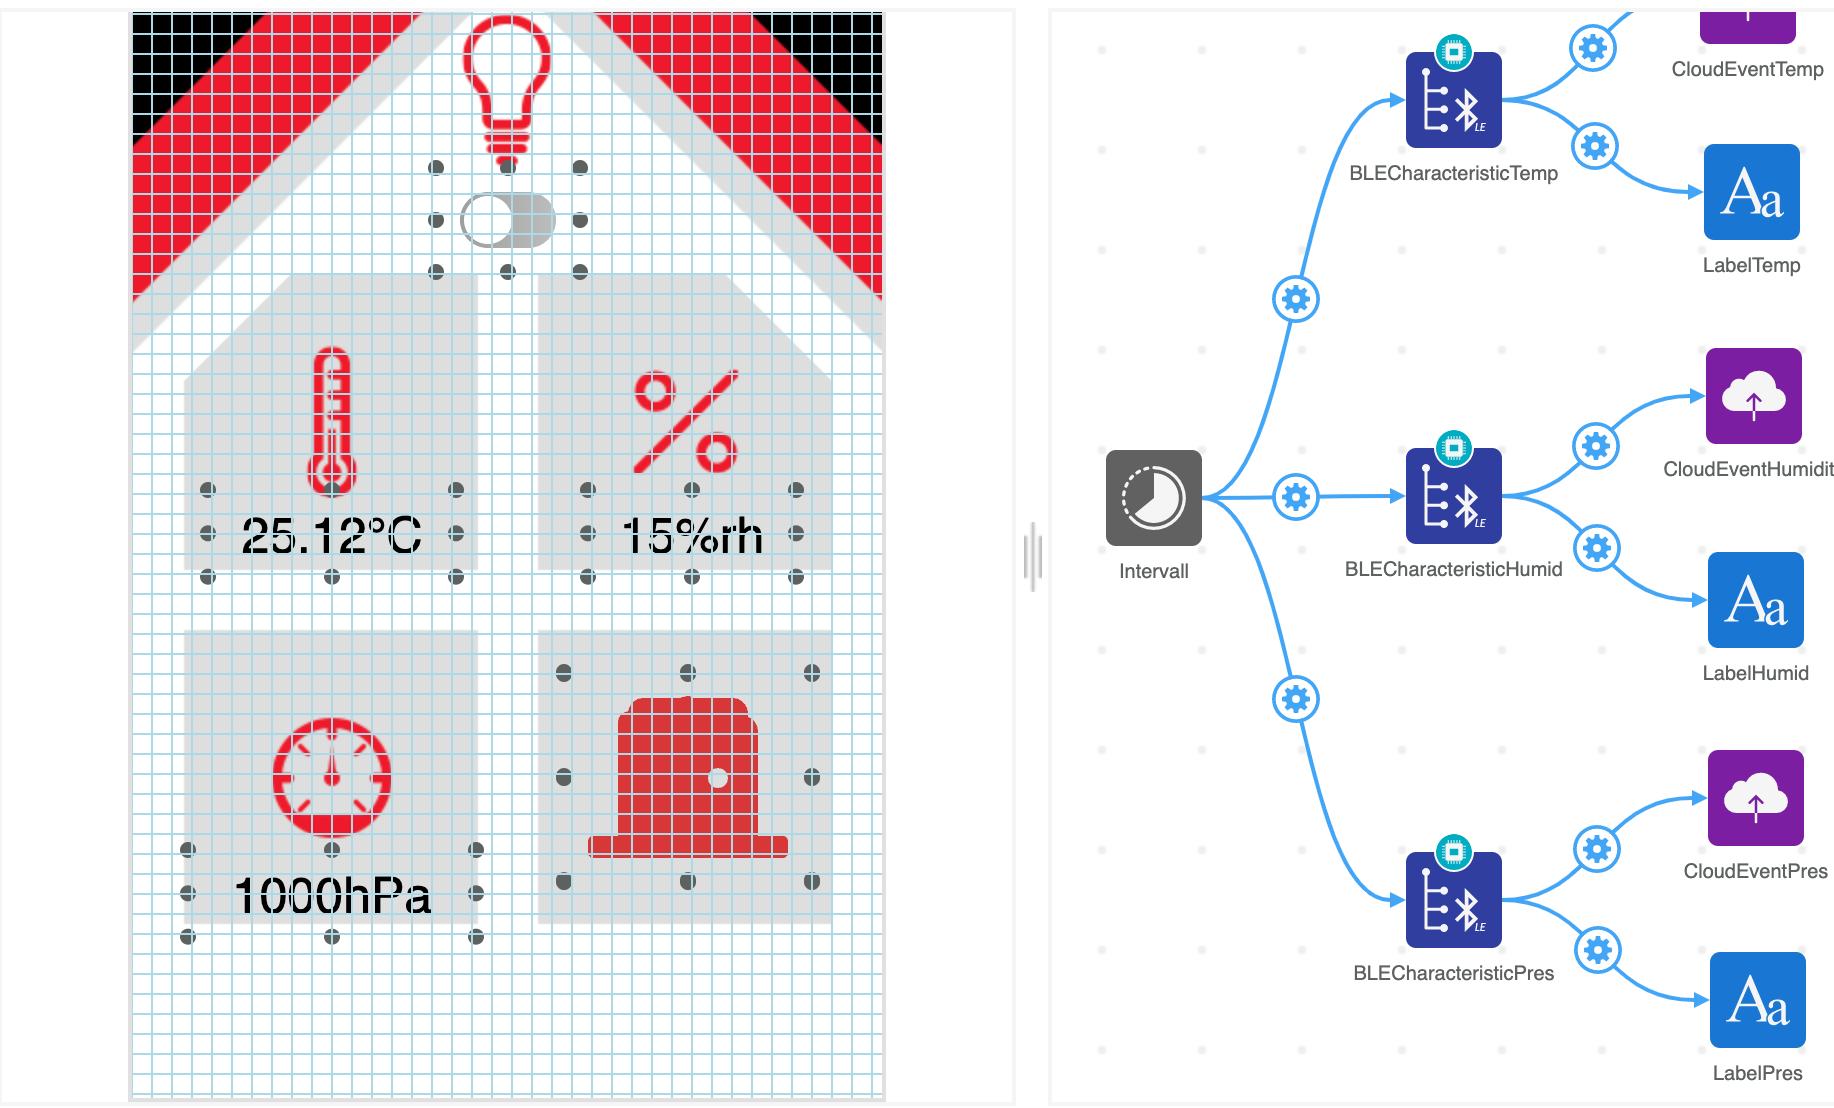 sensors_DigiKey_IoT_App_View.png